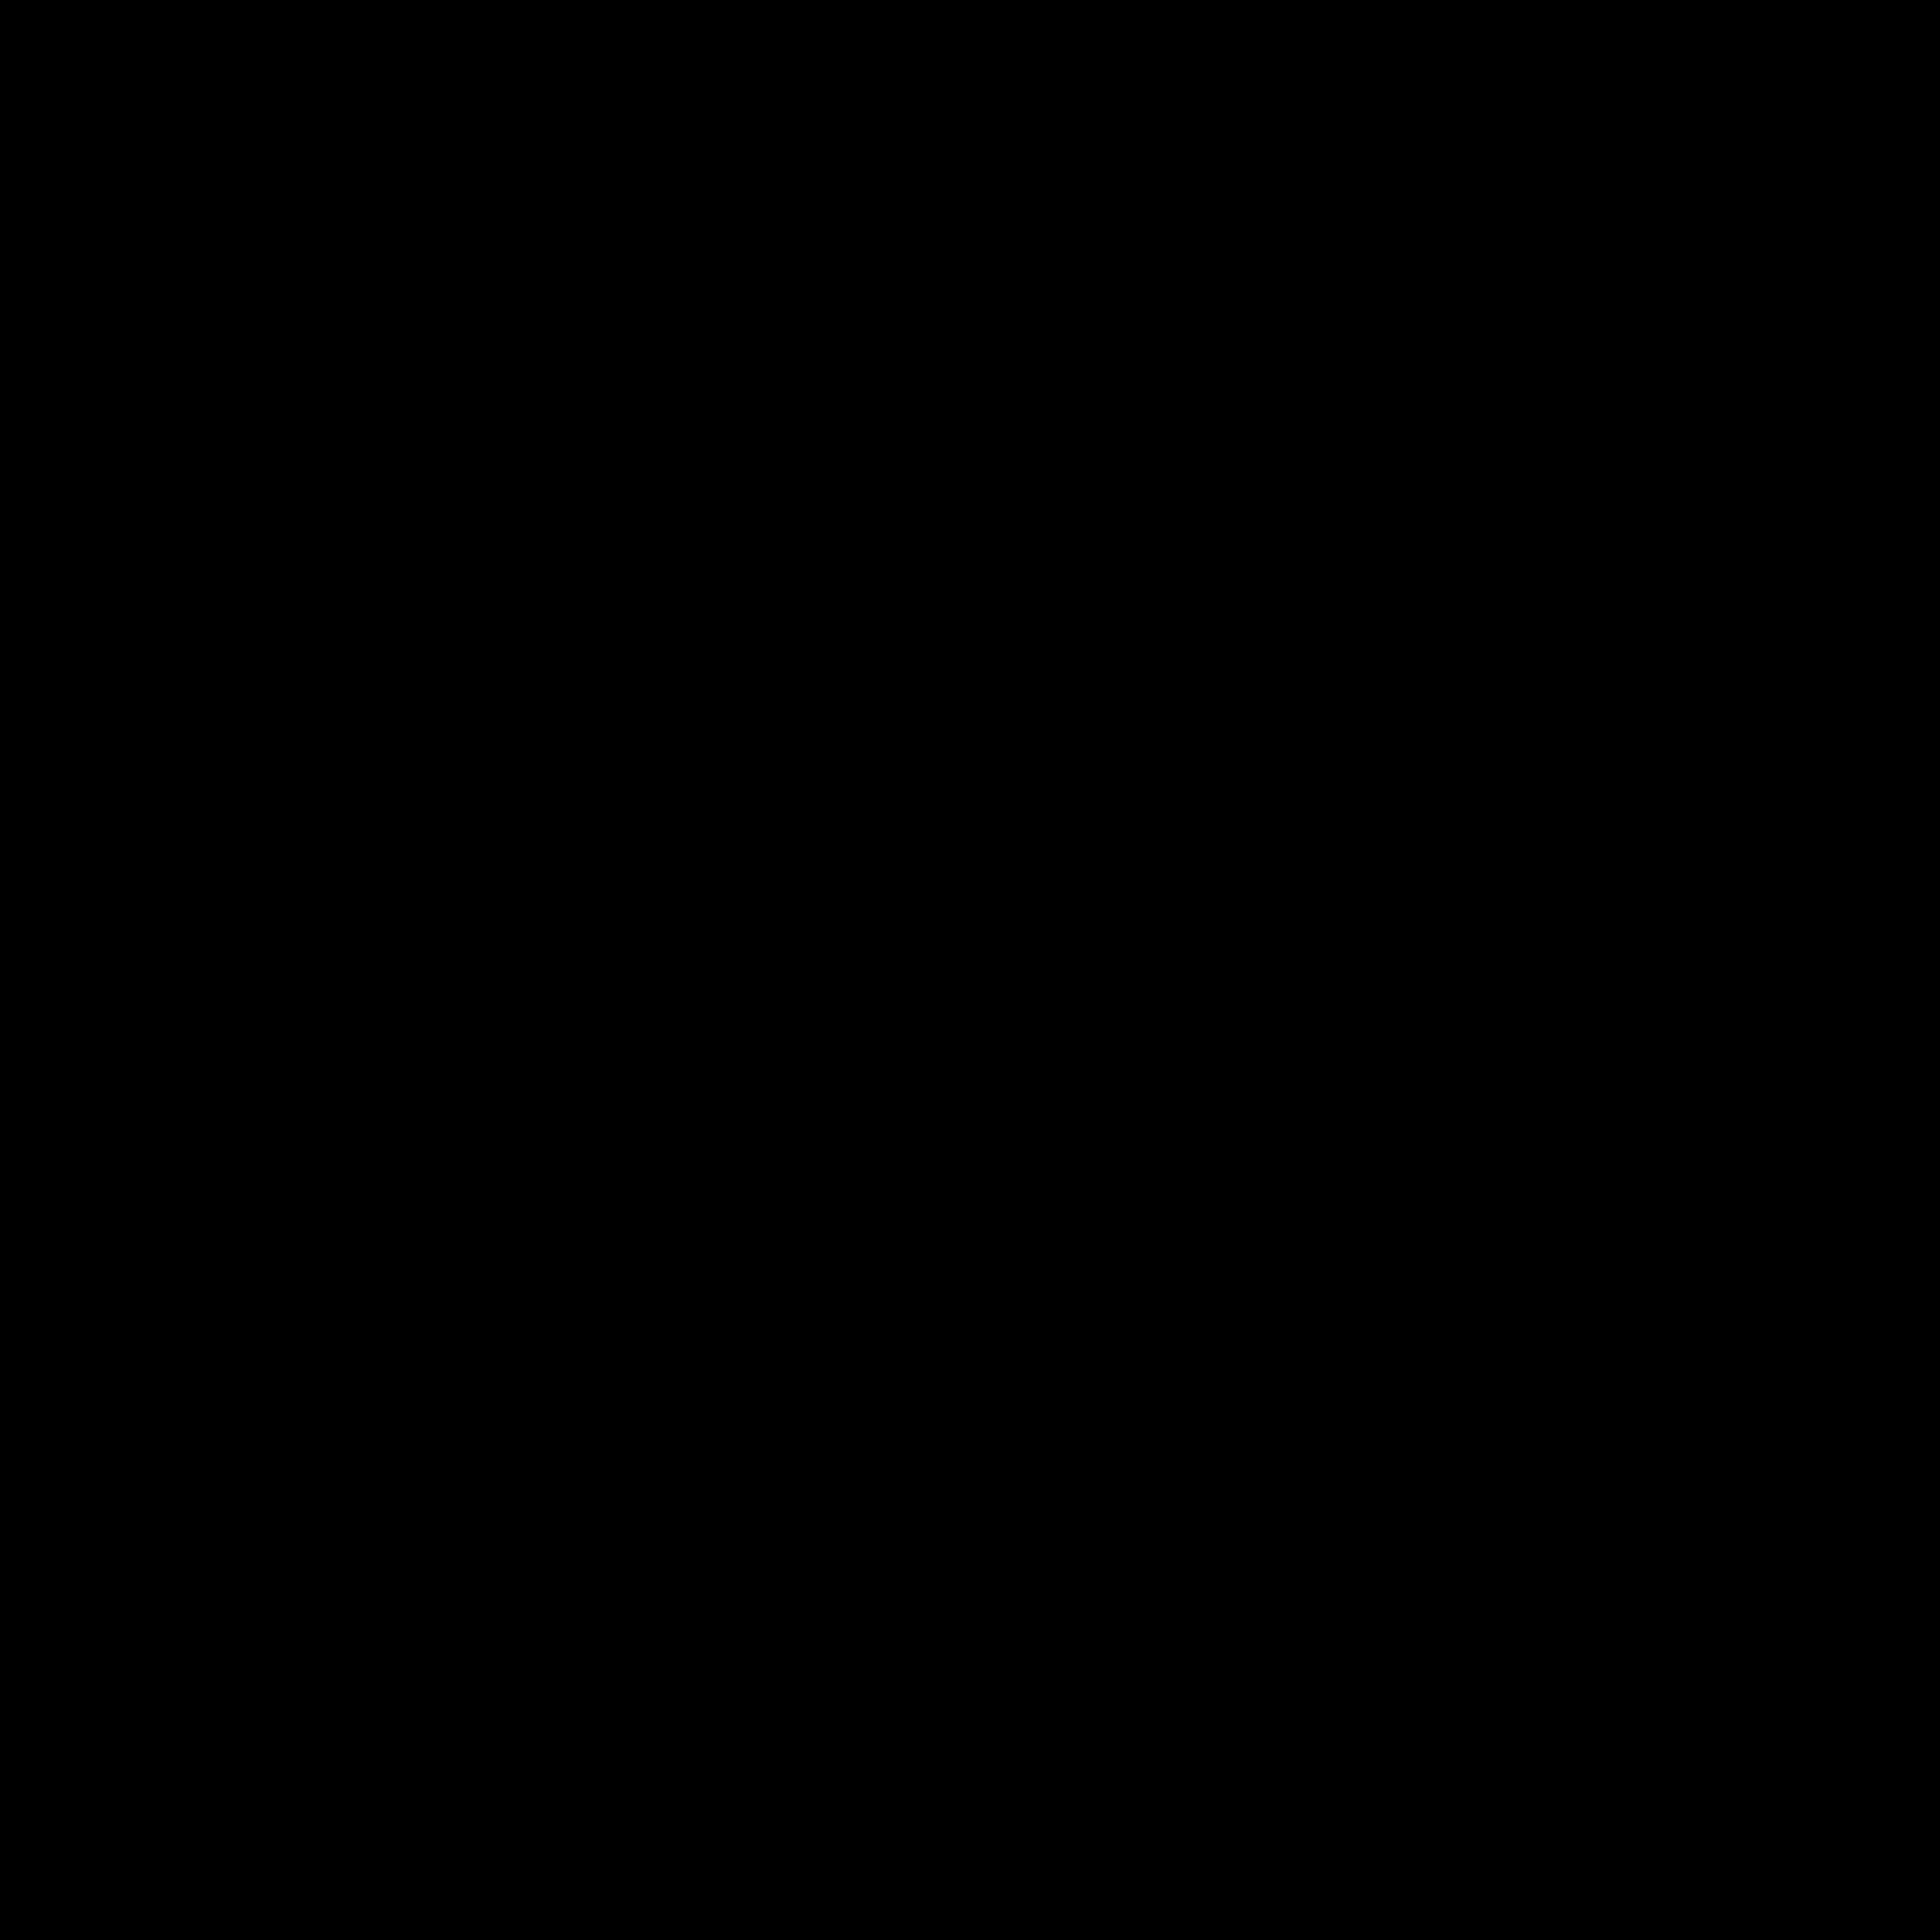 Key Bank Logo PNG Transparent & SVG Vector - Freebie Supply